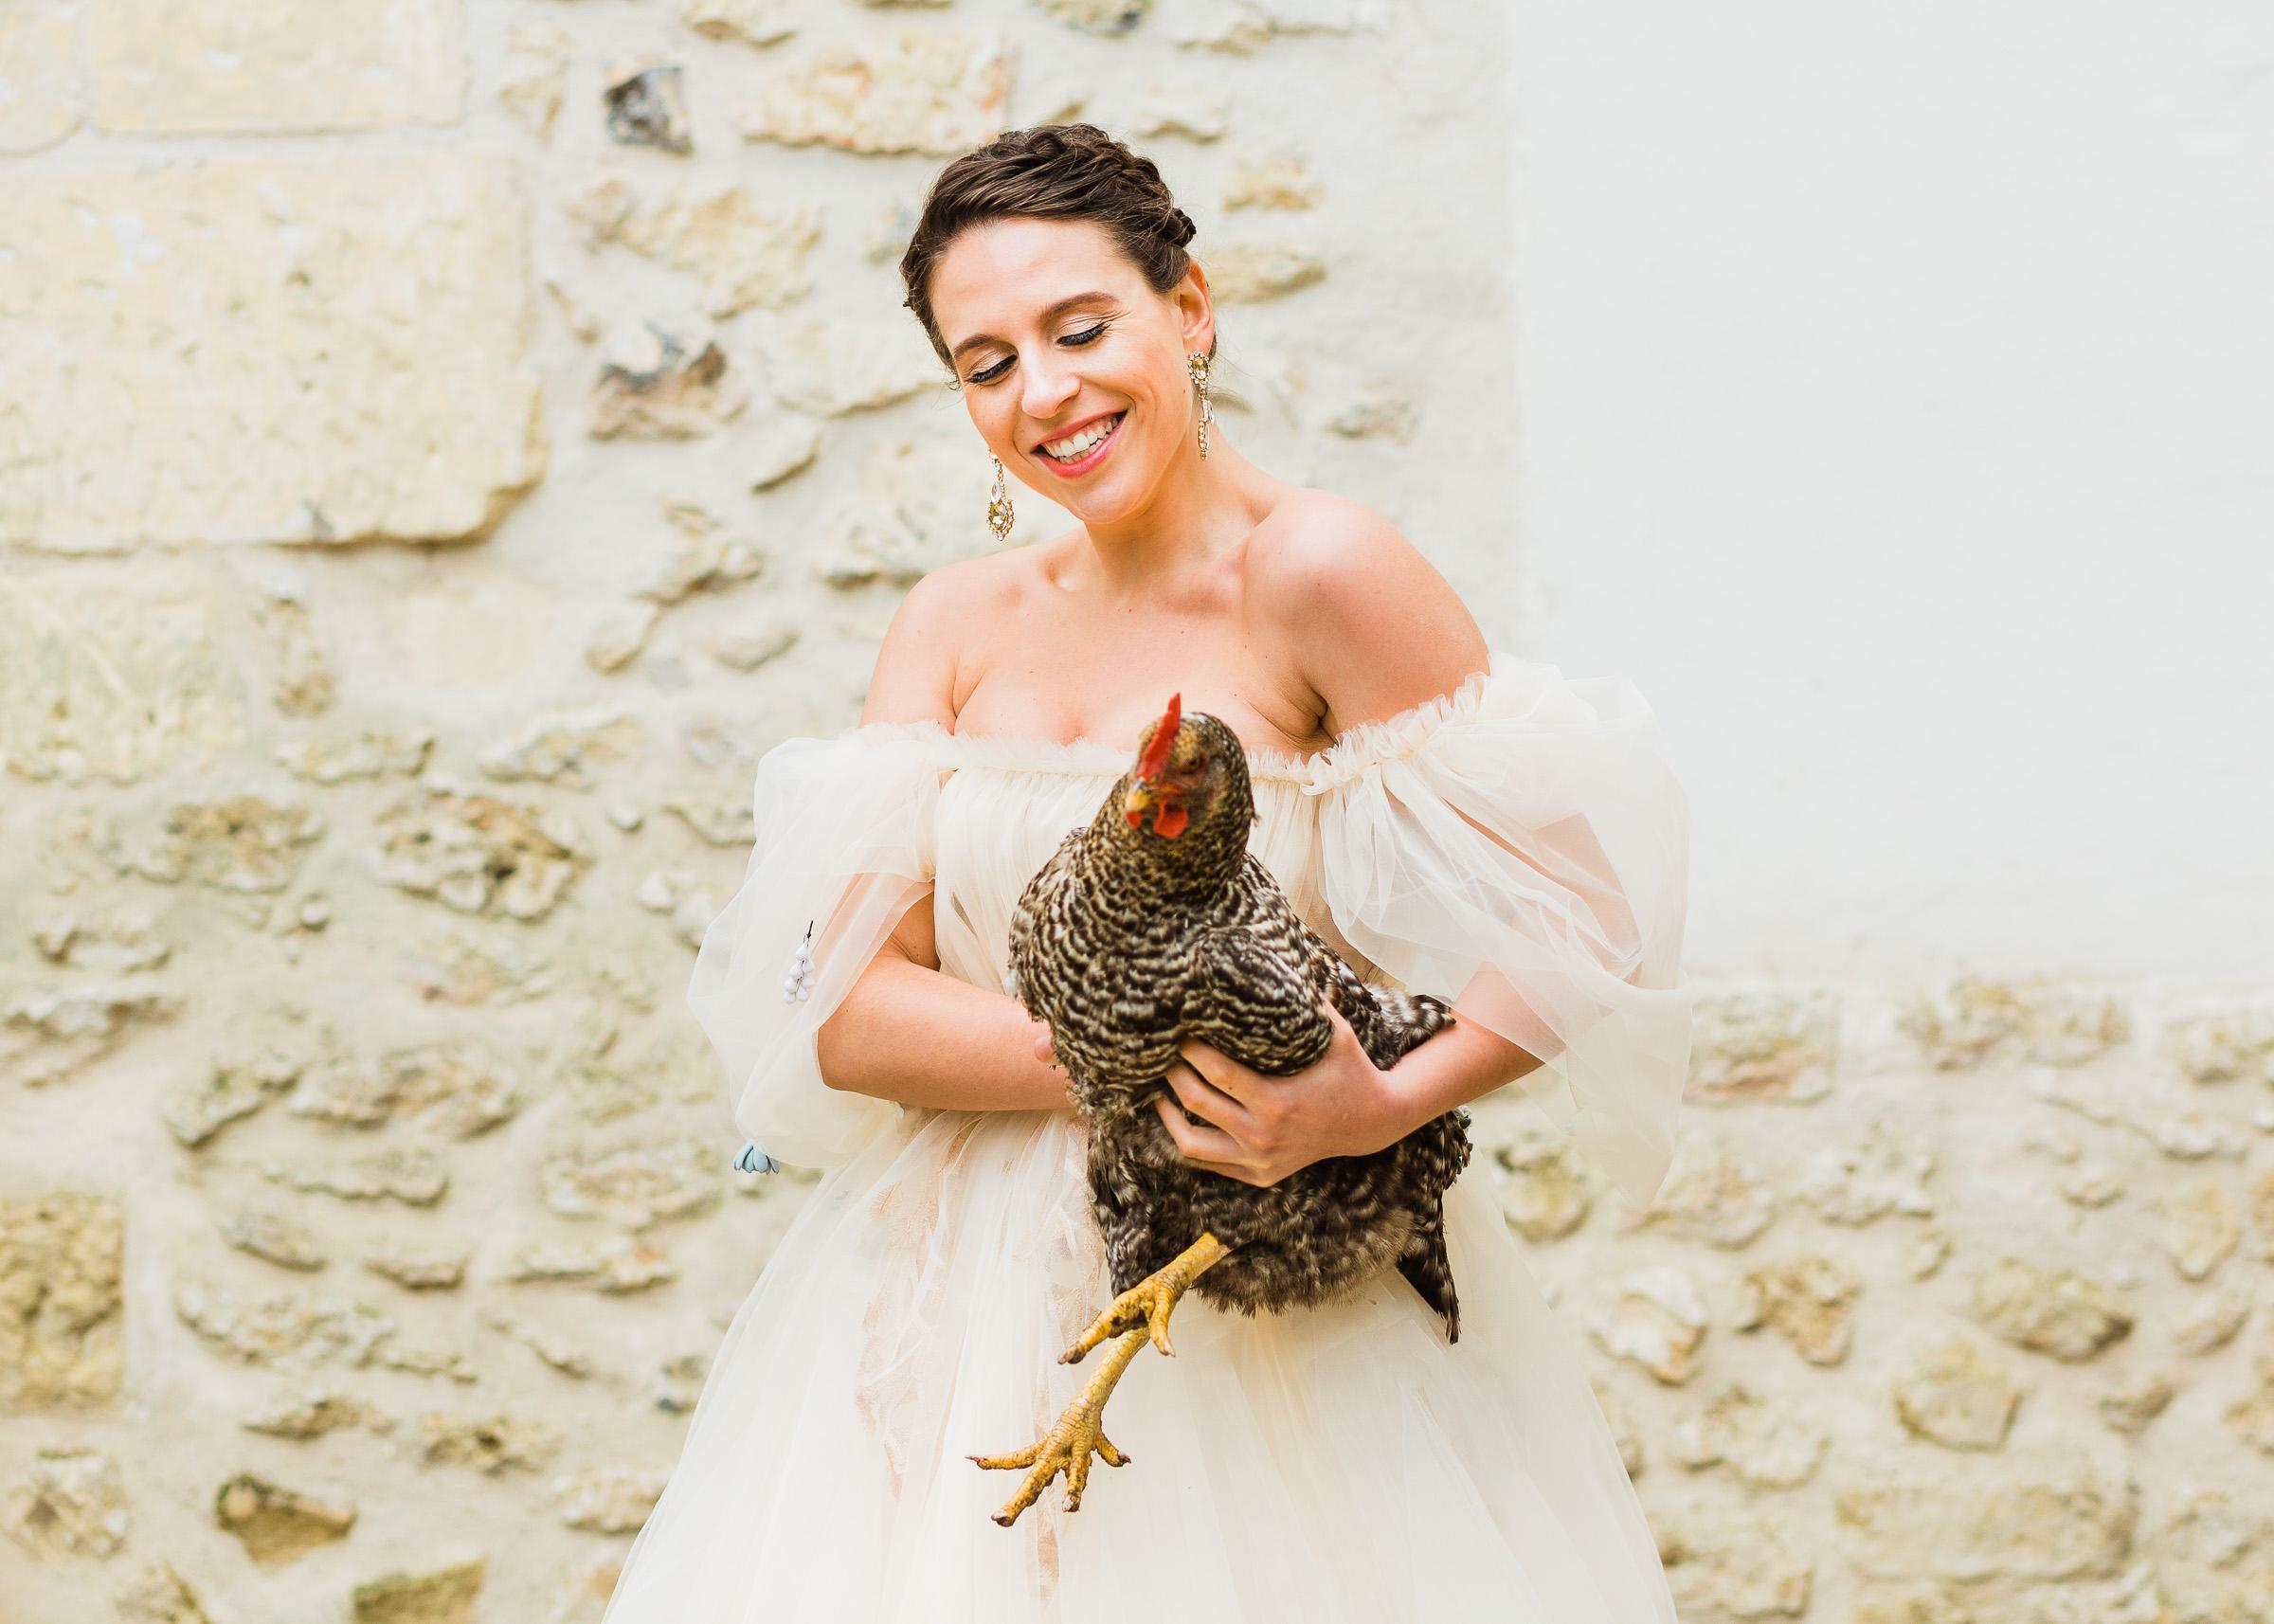 Portretfotografie moderne portret bruid met een kip boerderij by Birense Fotografie.jpg